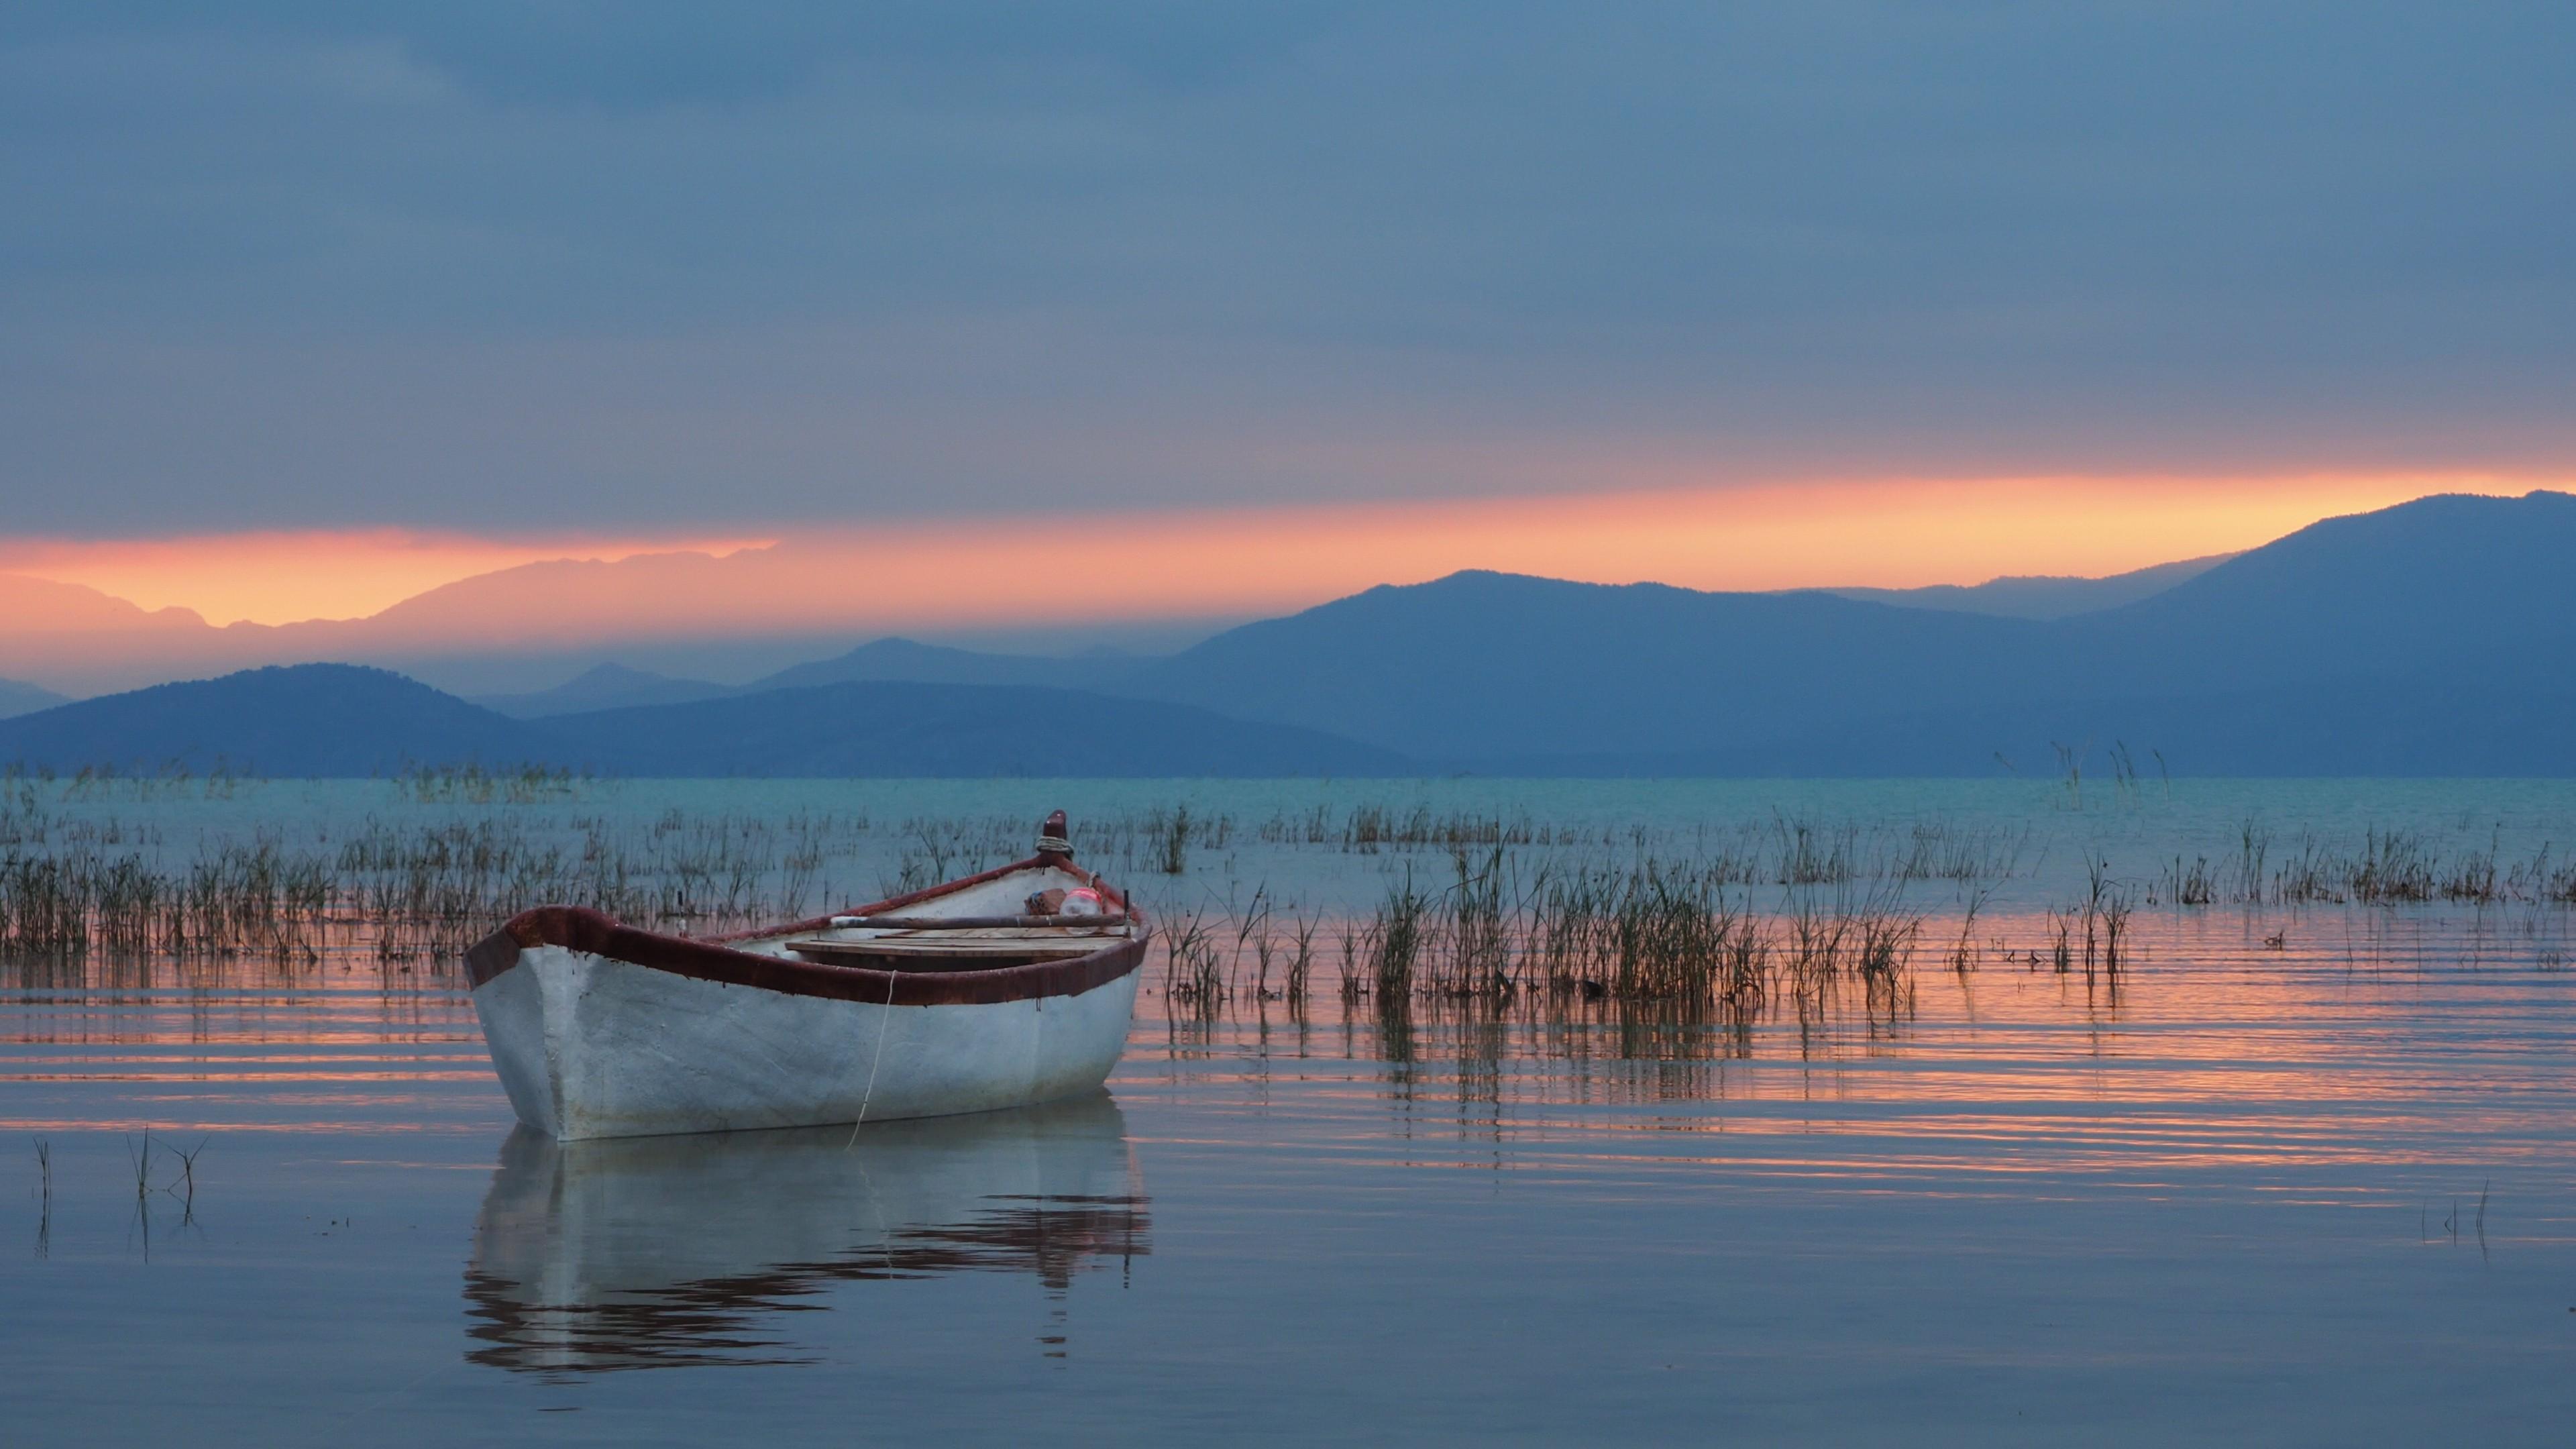 Lake Beyşehir at the foot of the Taurus Mountains wallpaper